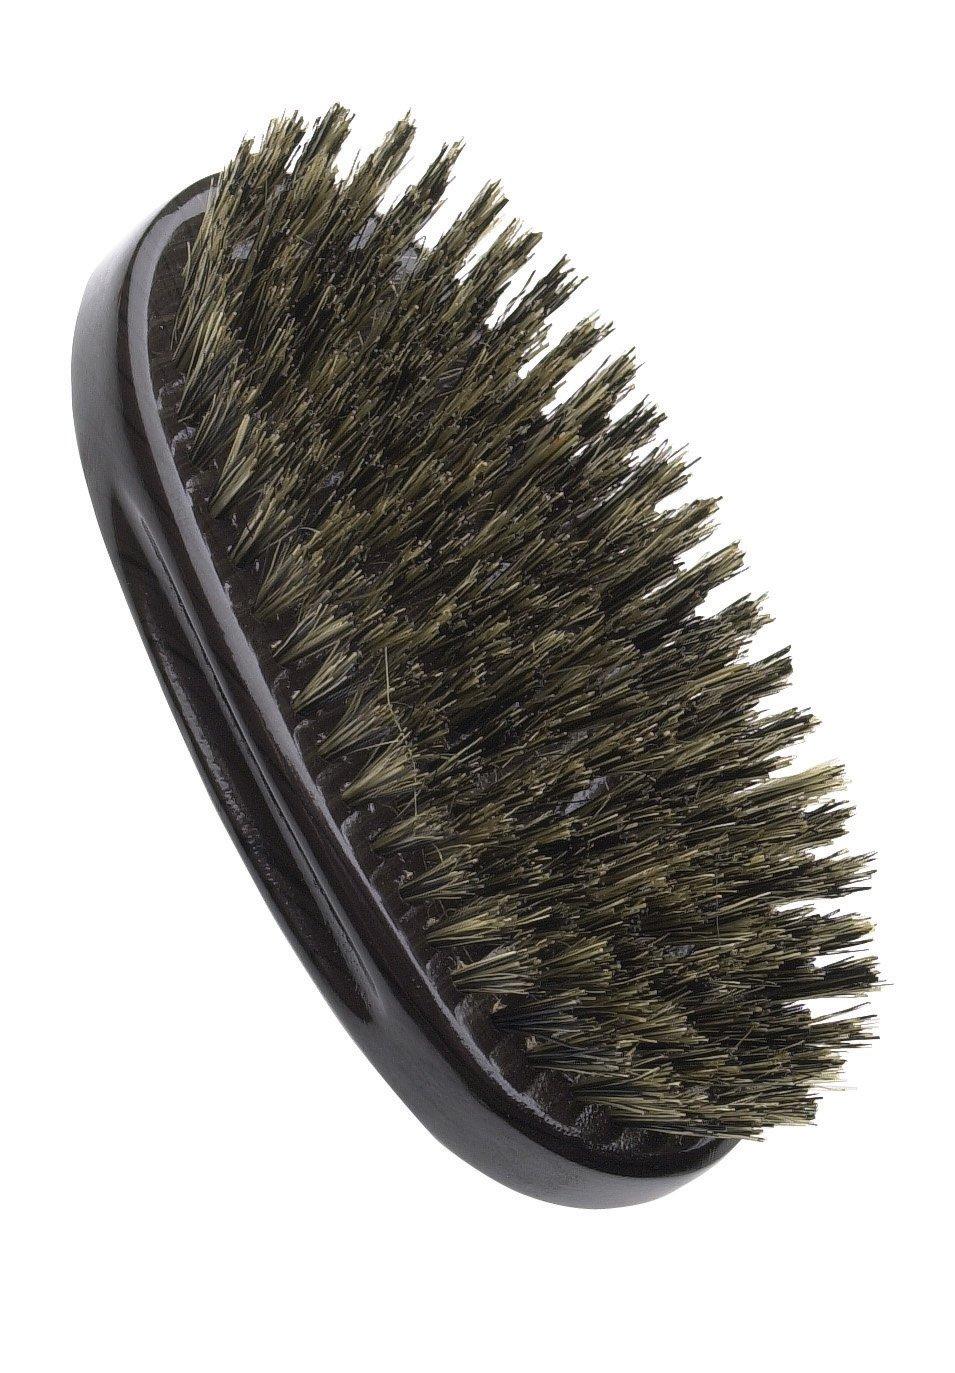 Amazon.com : Diane Original 5 Palm Brushes DBB105, Boar bristles, dark wood, natural bristle, grey wood handle, gray wood, salon, barber, professional, ...